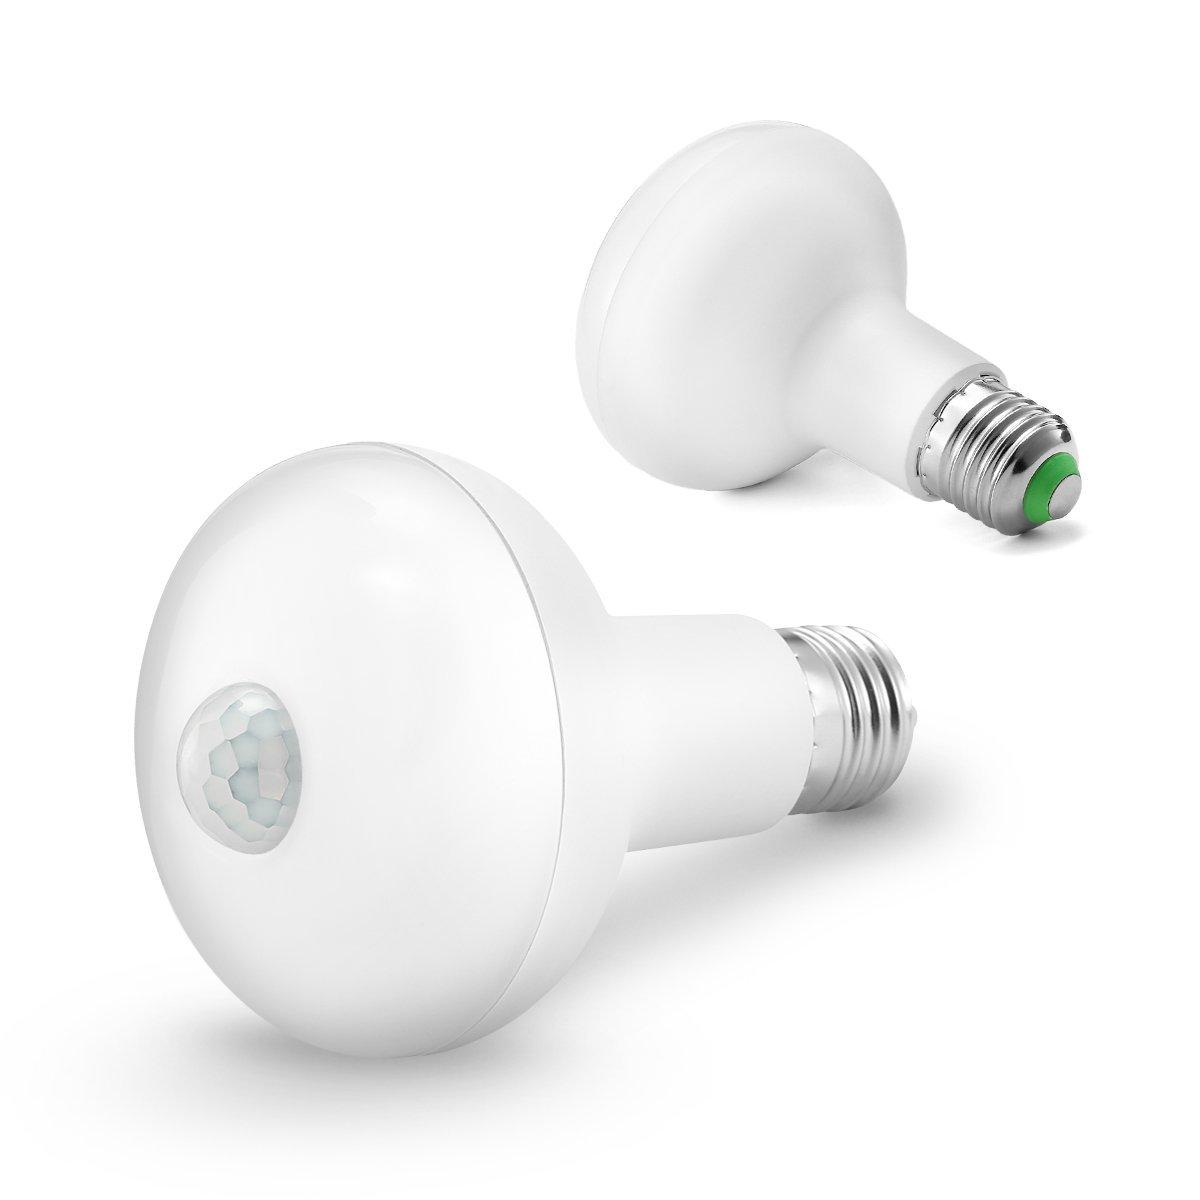 Motion Light Bulb, KINGSO E27 12W 24 LED Smartsense PIR Infrared Motion Detection Light Sensor PIR Bulb Lamp Auto Switch Stairs Night Lights Energy Saving for Security Decoration-12W Warm White